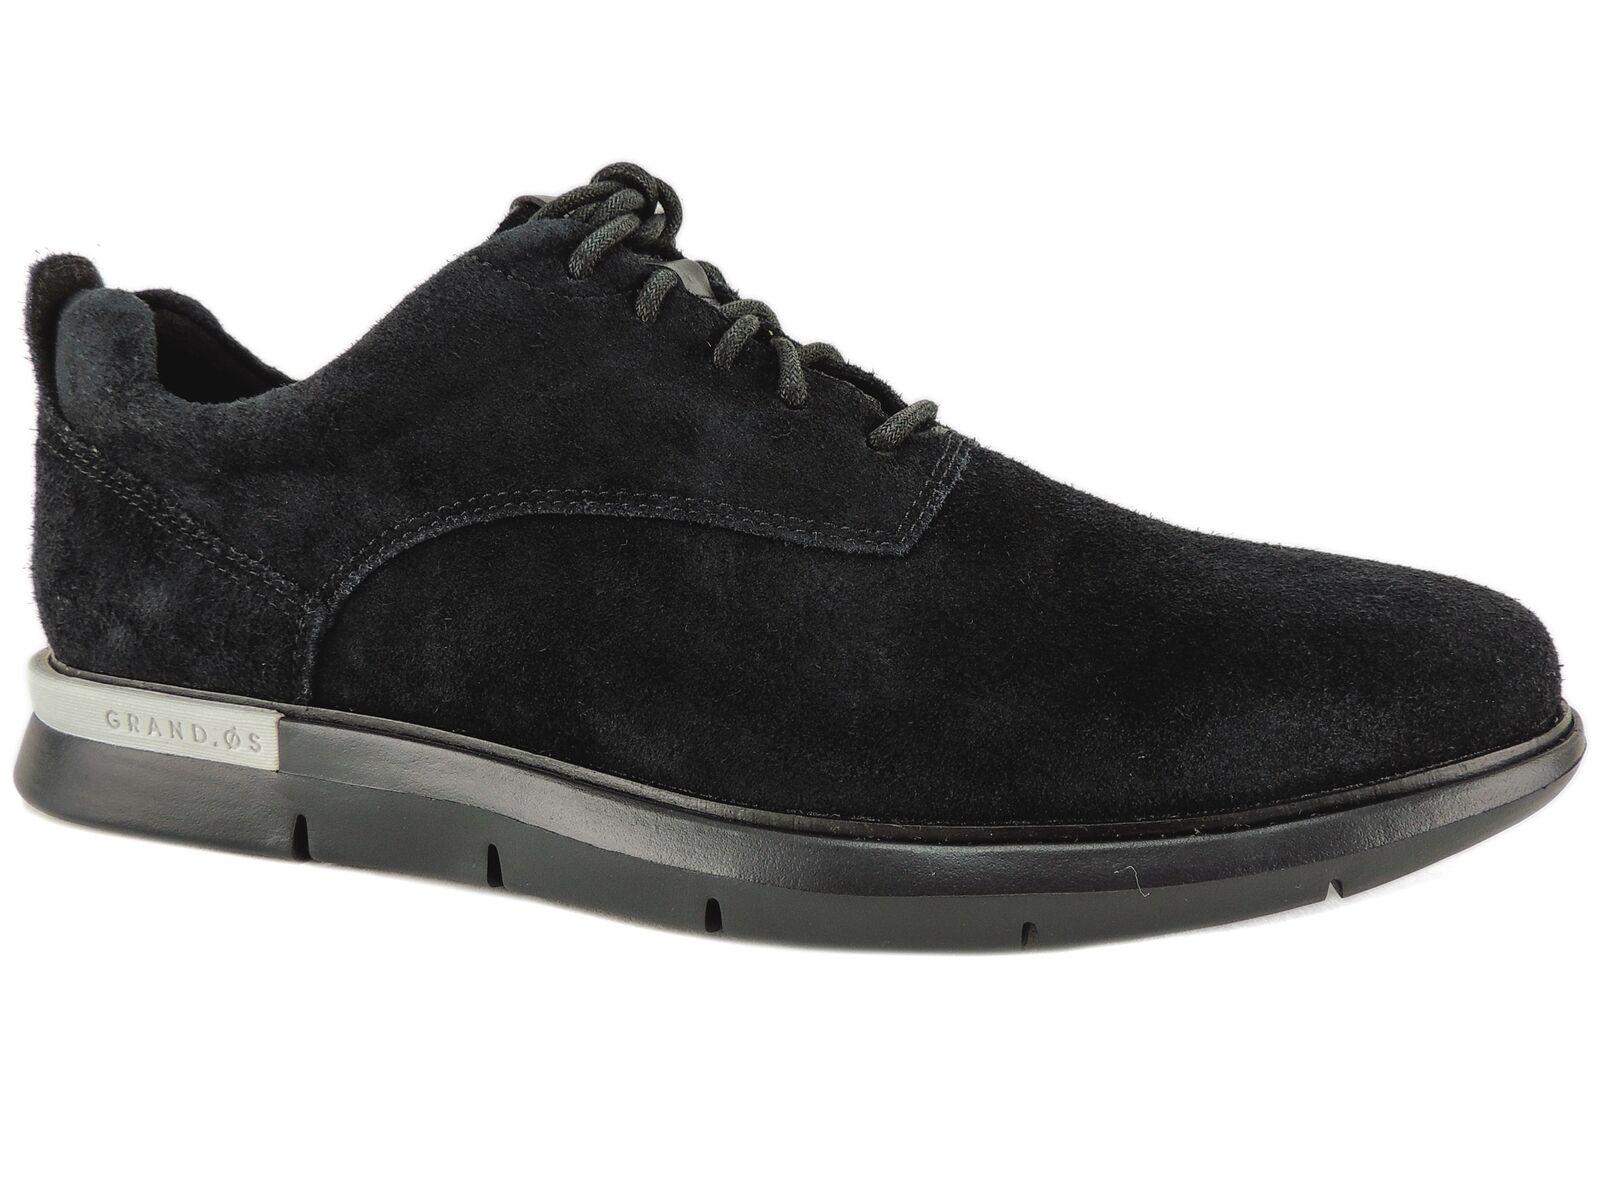 Cole Haan Men's Grand Horizon Oxford II Sneakers Black Black Size 10 M